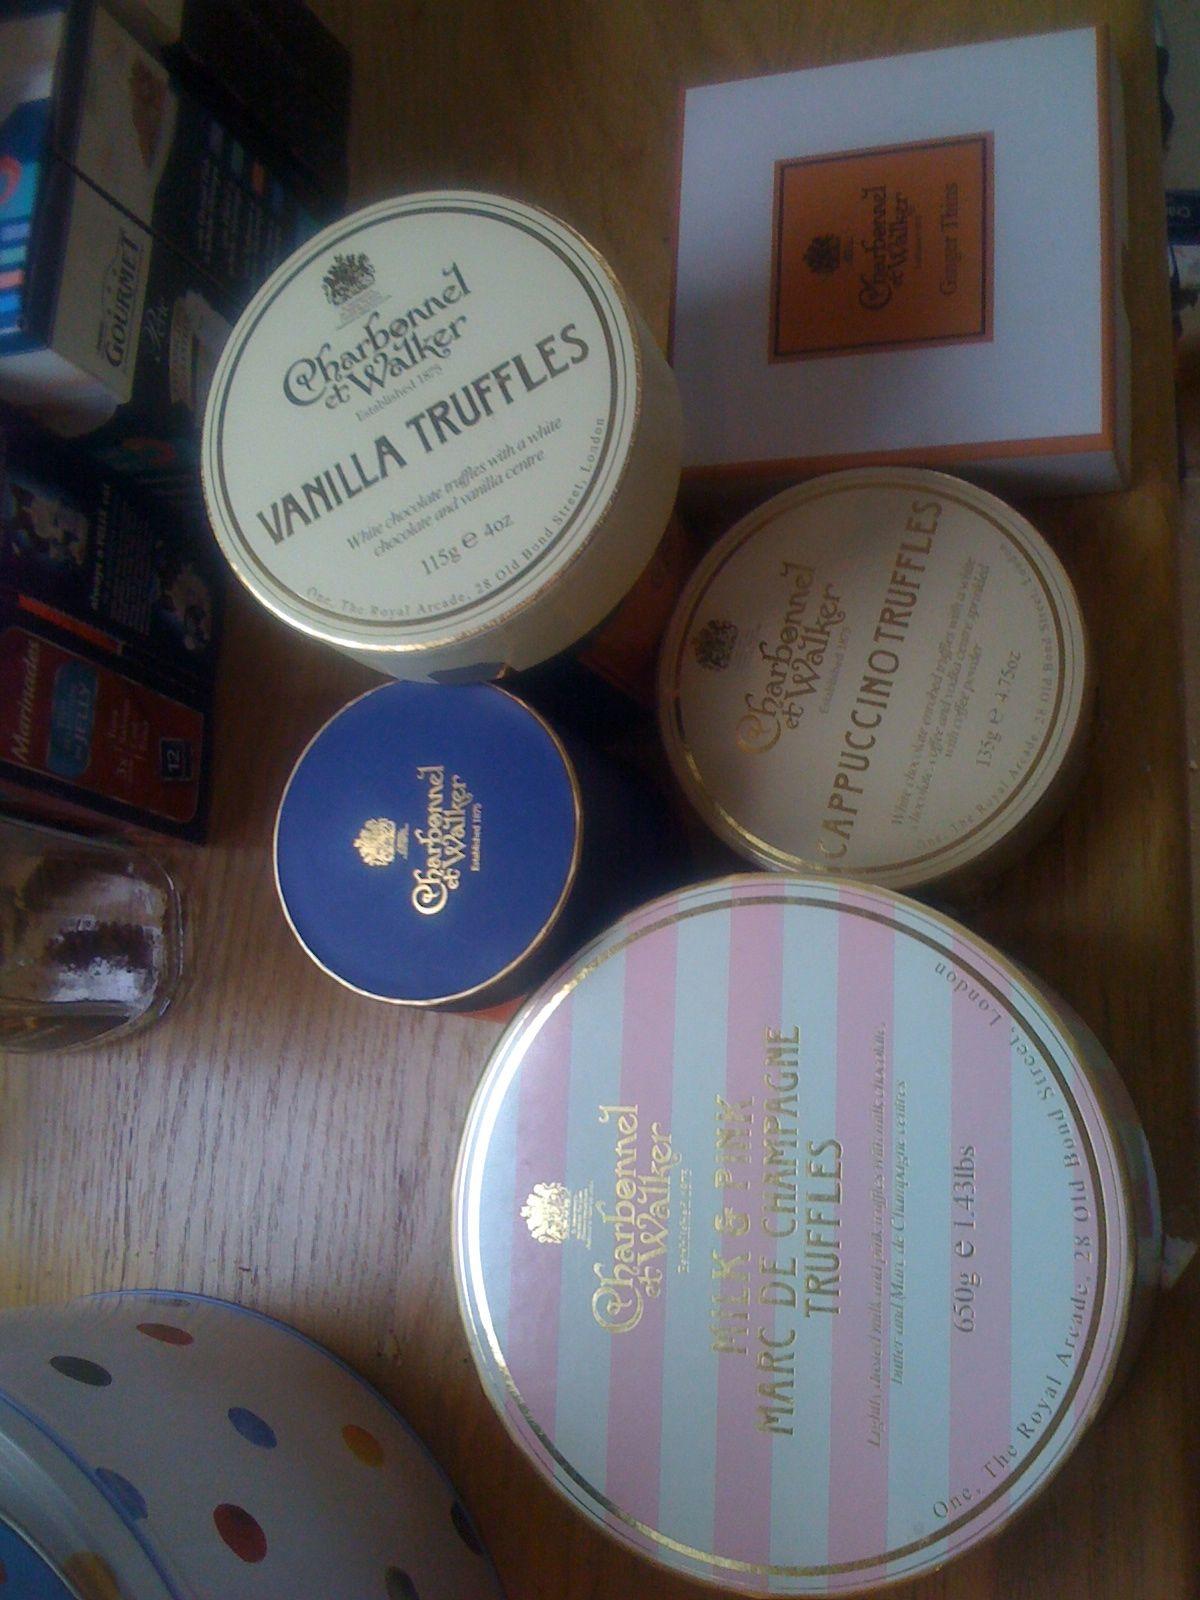 tempting treats...my collection of Charbonnel et Walker (With images) | Charbonnel et walker. Truffles. Walker